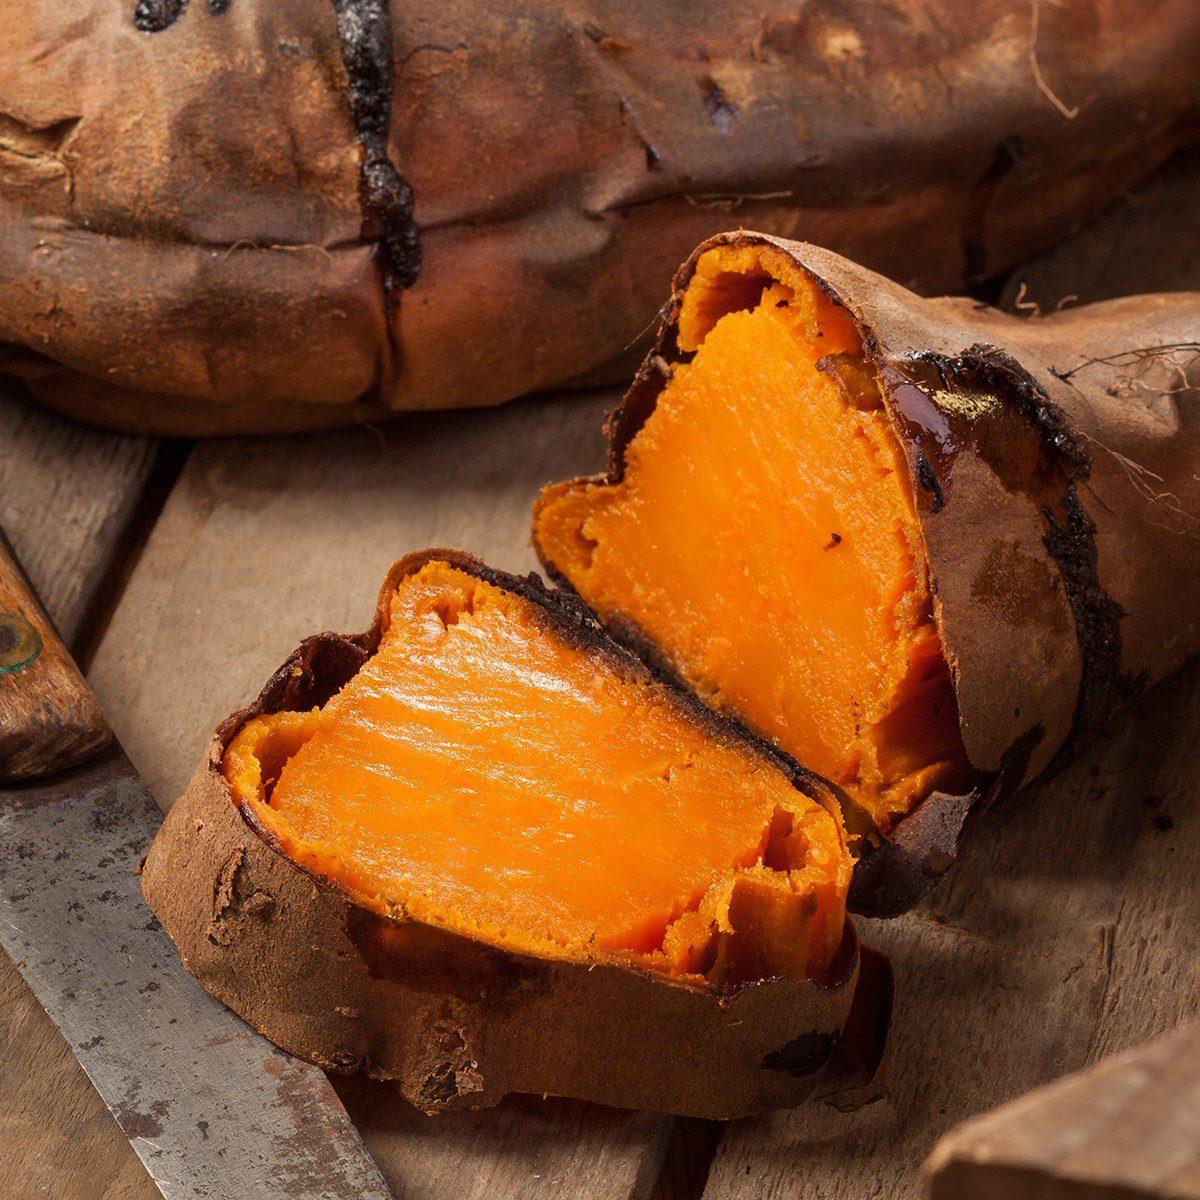 Oven baked sweet potatoes on vintage wood.